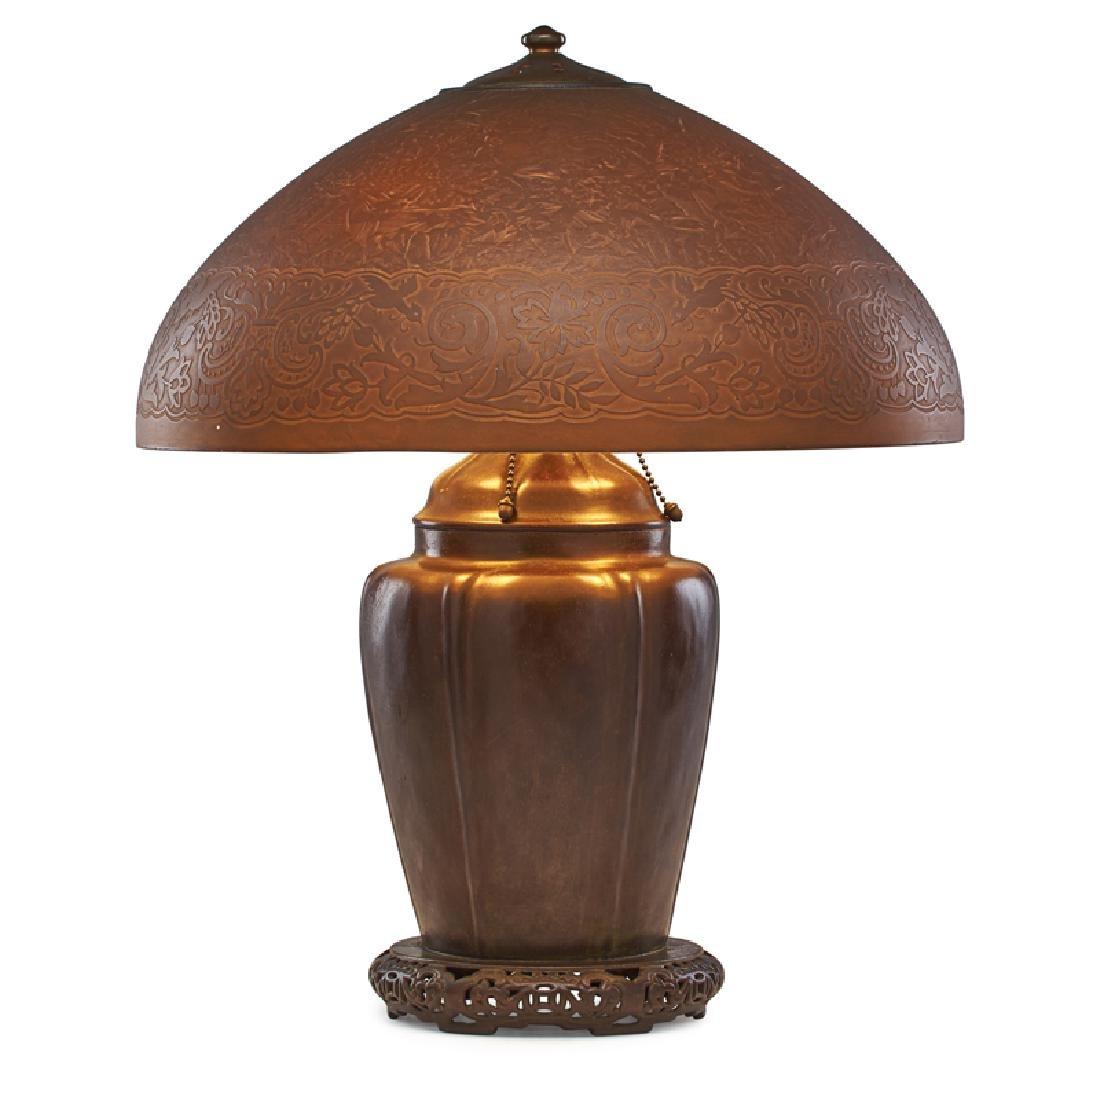 HANDEL Chinese table lamp, Brown Mosserine shade